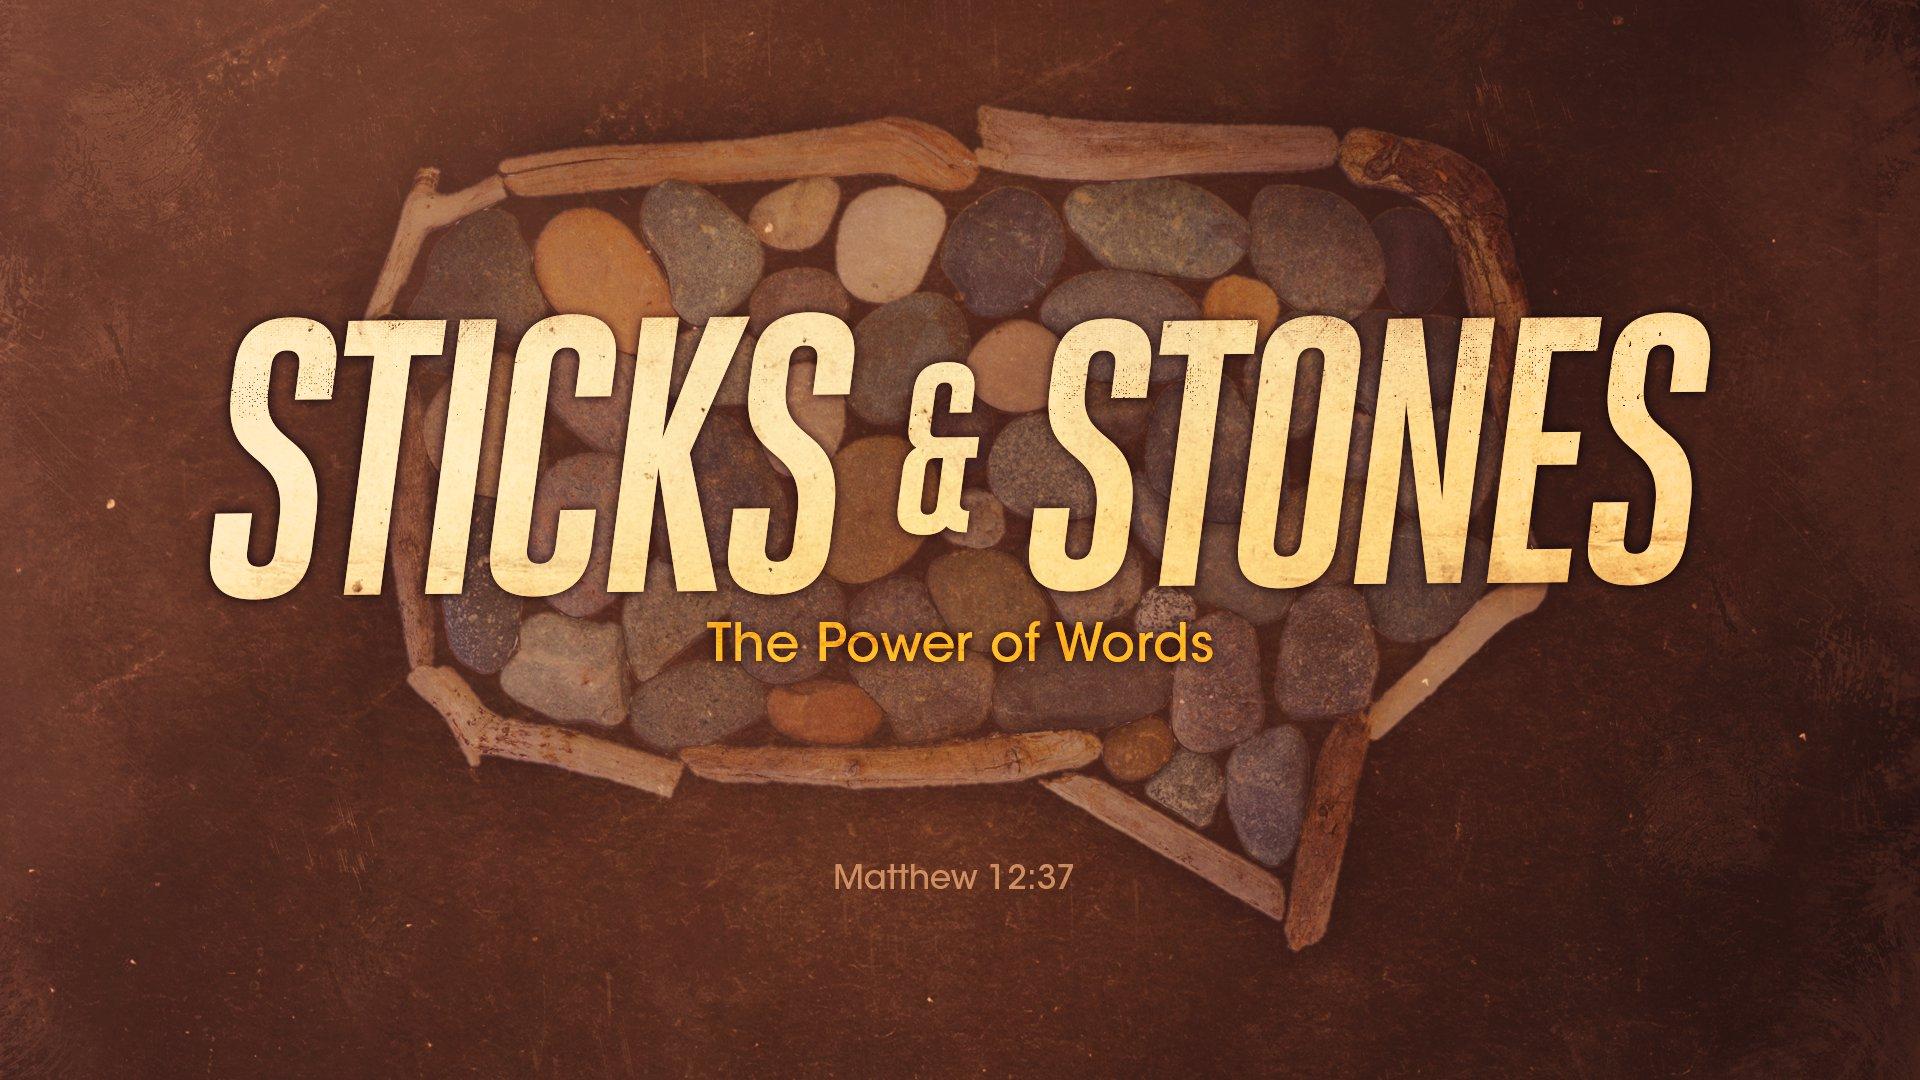 SticksAndStones-Theme.jpg